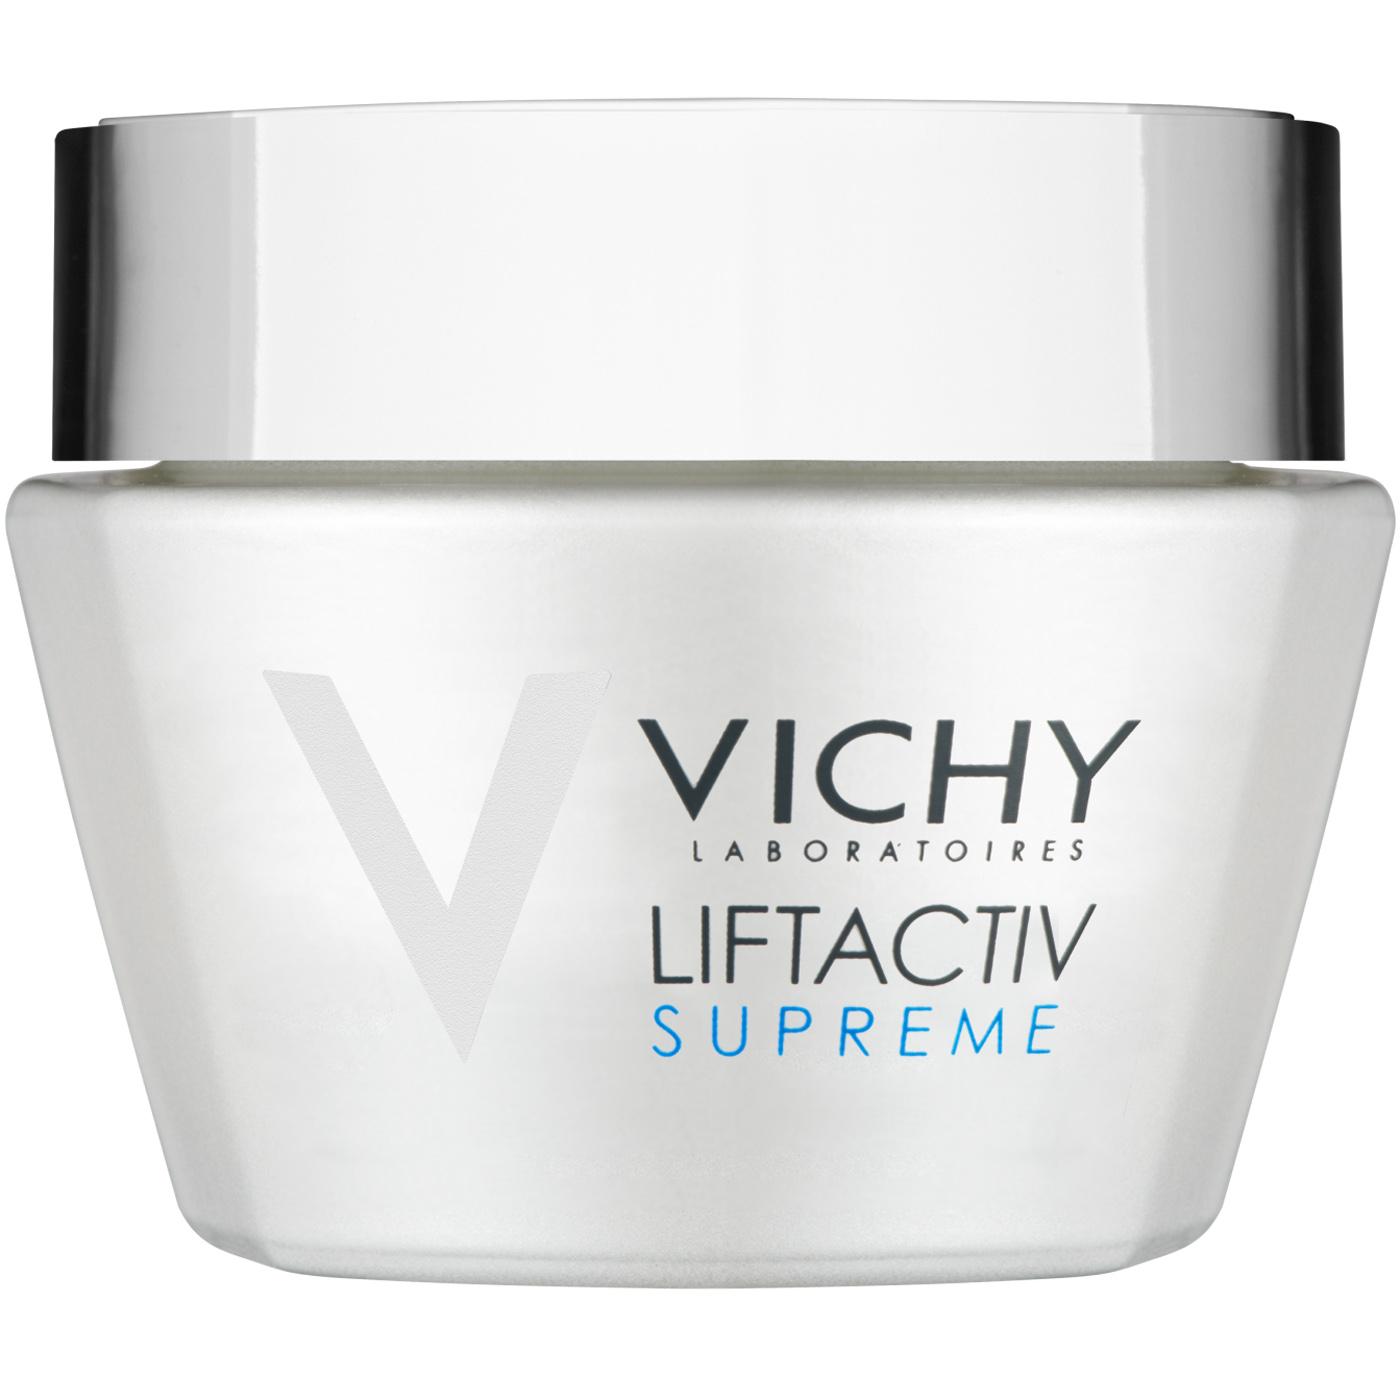 Vichy Liftactiv Supreme Αντιρυτιδική & Συσφικτική Κρέμα Προσώπου Κανονική / Μικτή & Ευαίσθητη Επιδερμίδα 50ml